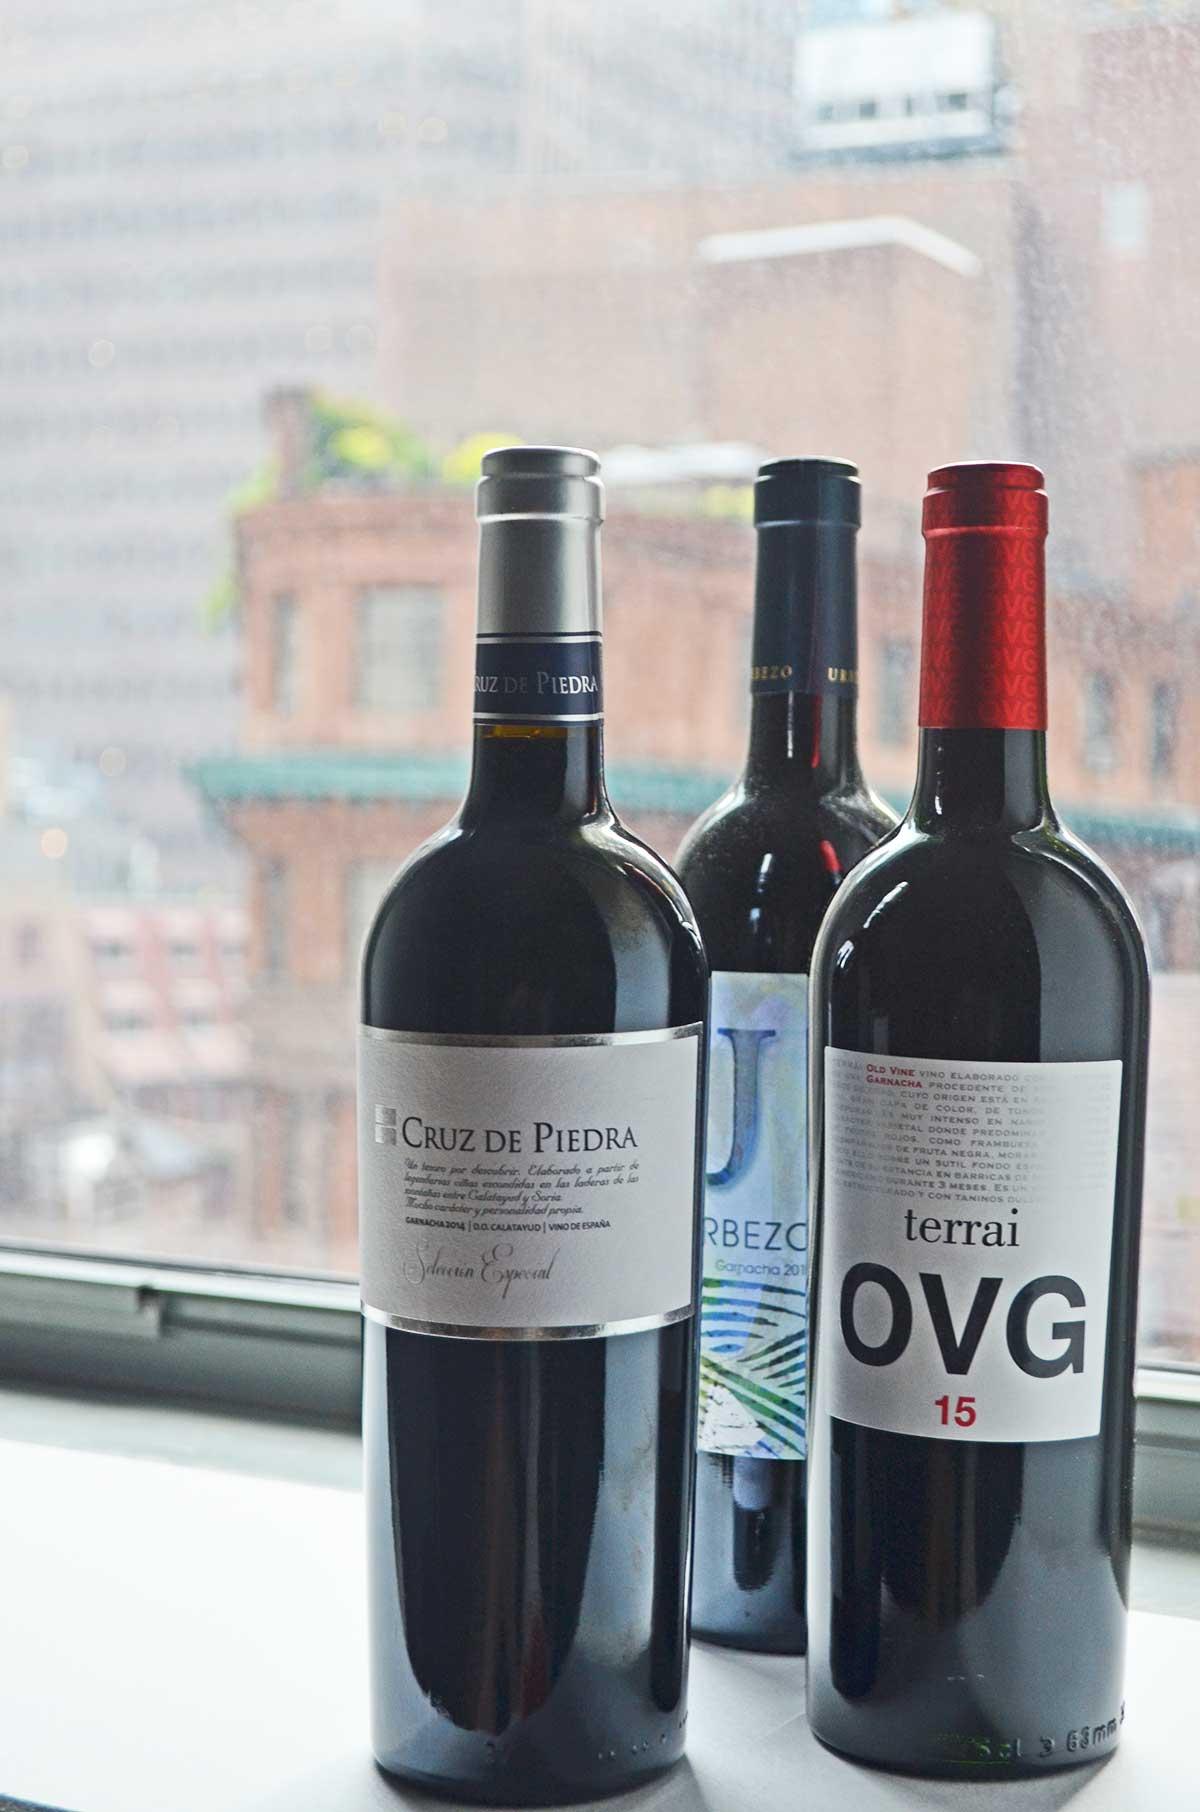 garnacha wine variety in the USA